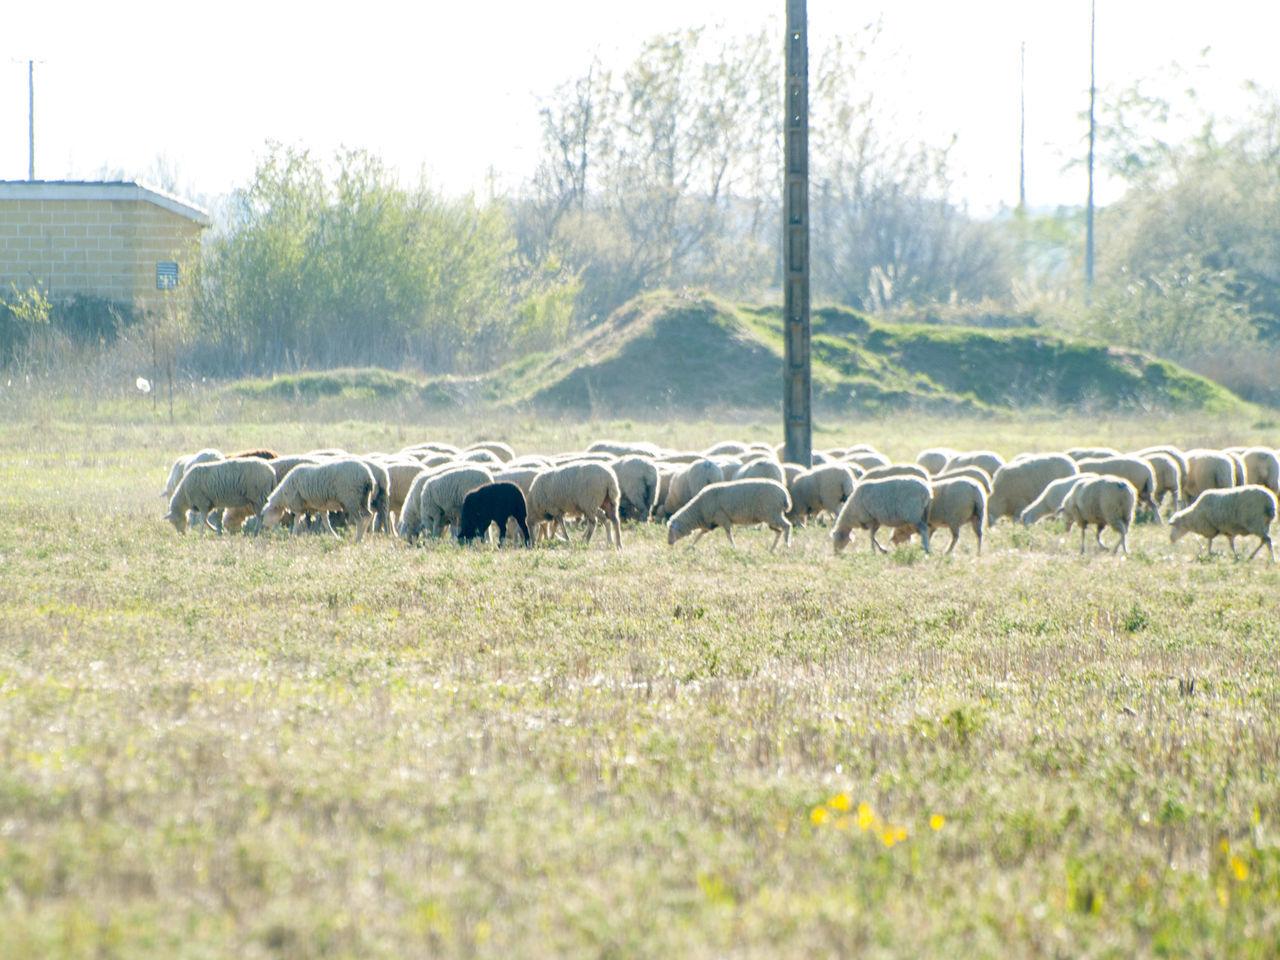 Abundance Animal Animal Themes Countryside Day Farm Life Farming Field Flock Of Sheep Grassland Grazing Lambs Landscape Large Group Of Animals Nature No People Outdoors Pasture, Paddock, Grassland, Pastureland Rural Landscape Rural Life Sheep Sheeps Stubble Tree Village Life